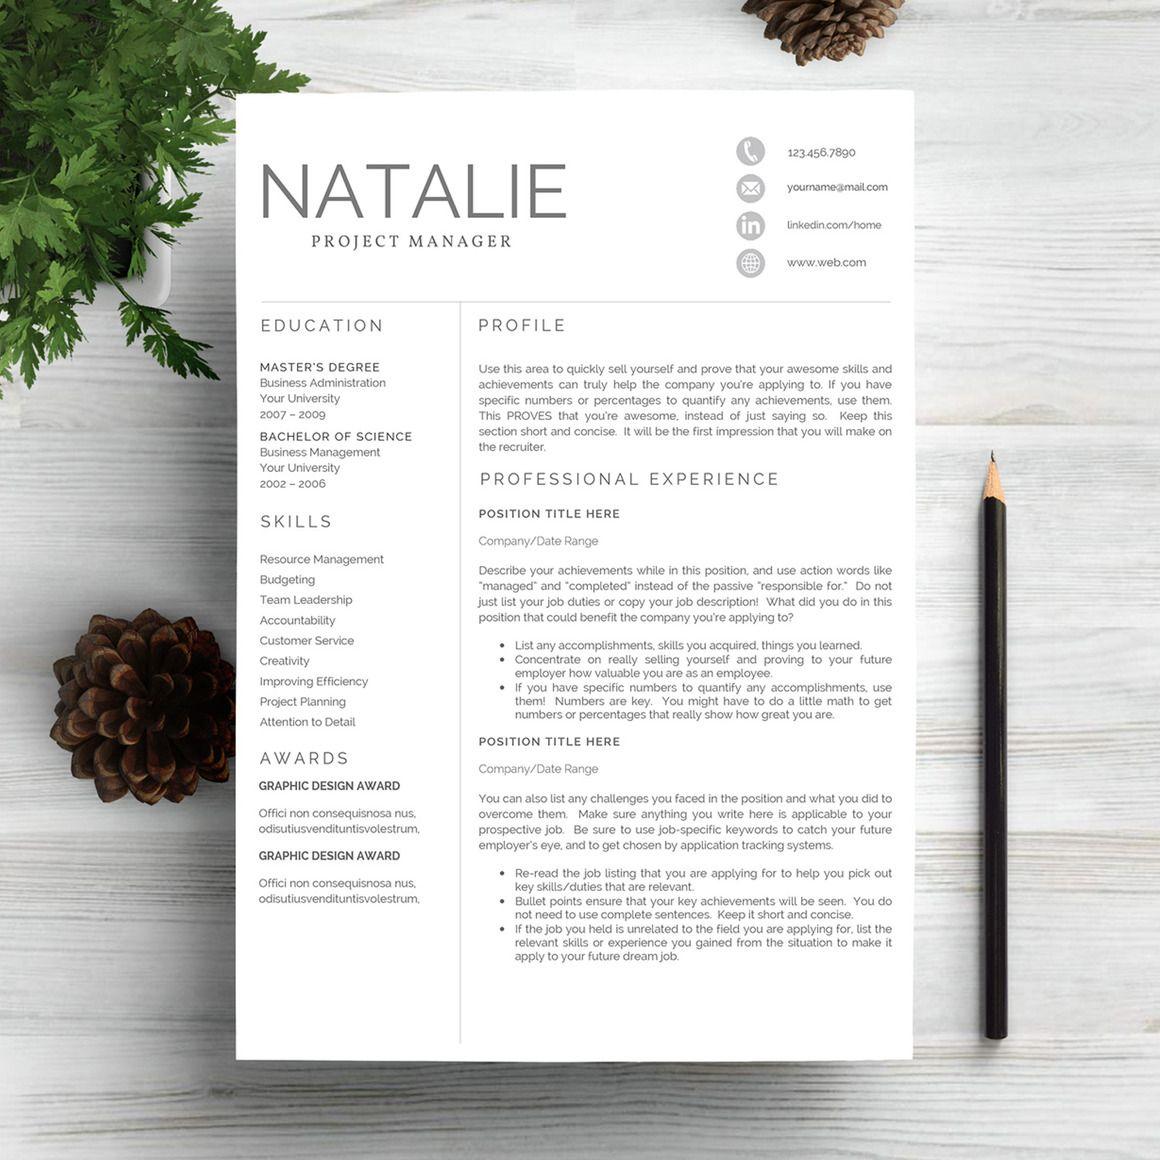 Professional Resume Template CV - Resumes | Resume | Pinterest